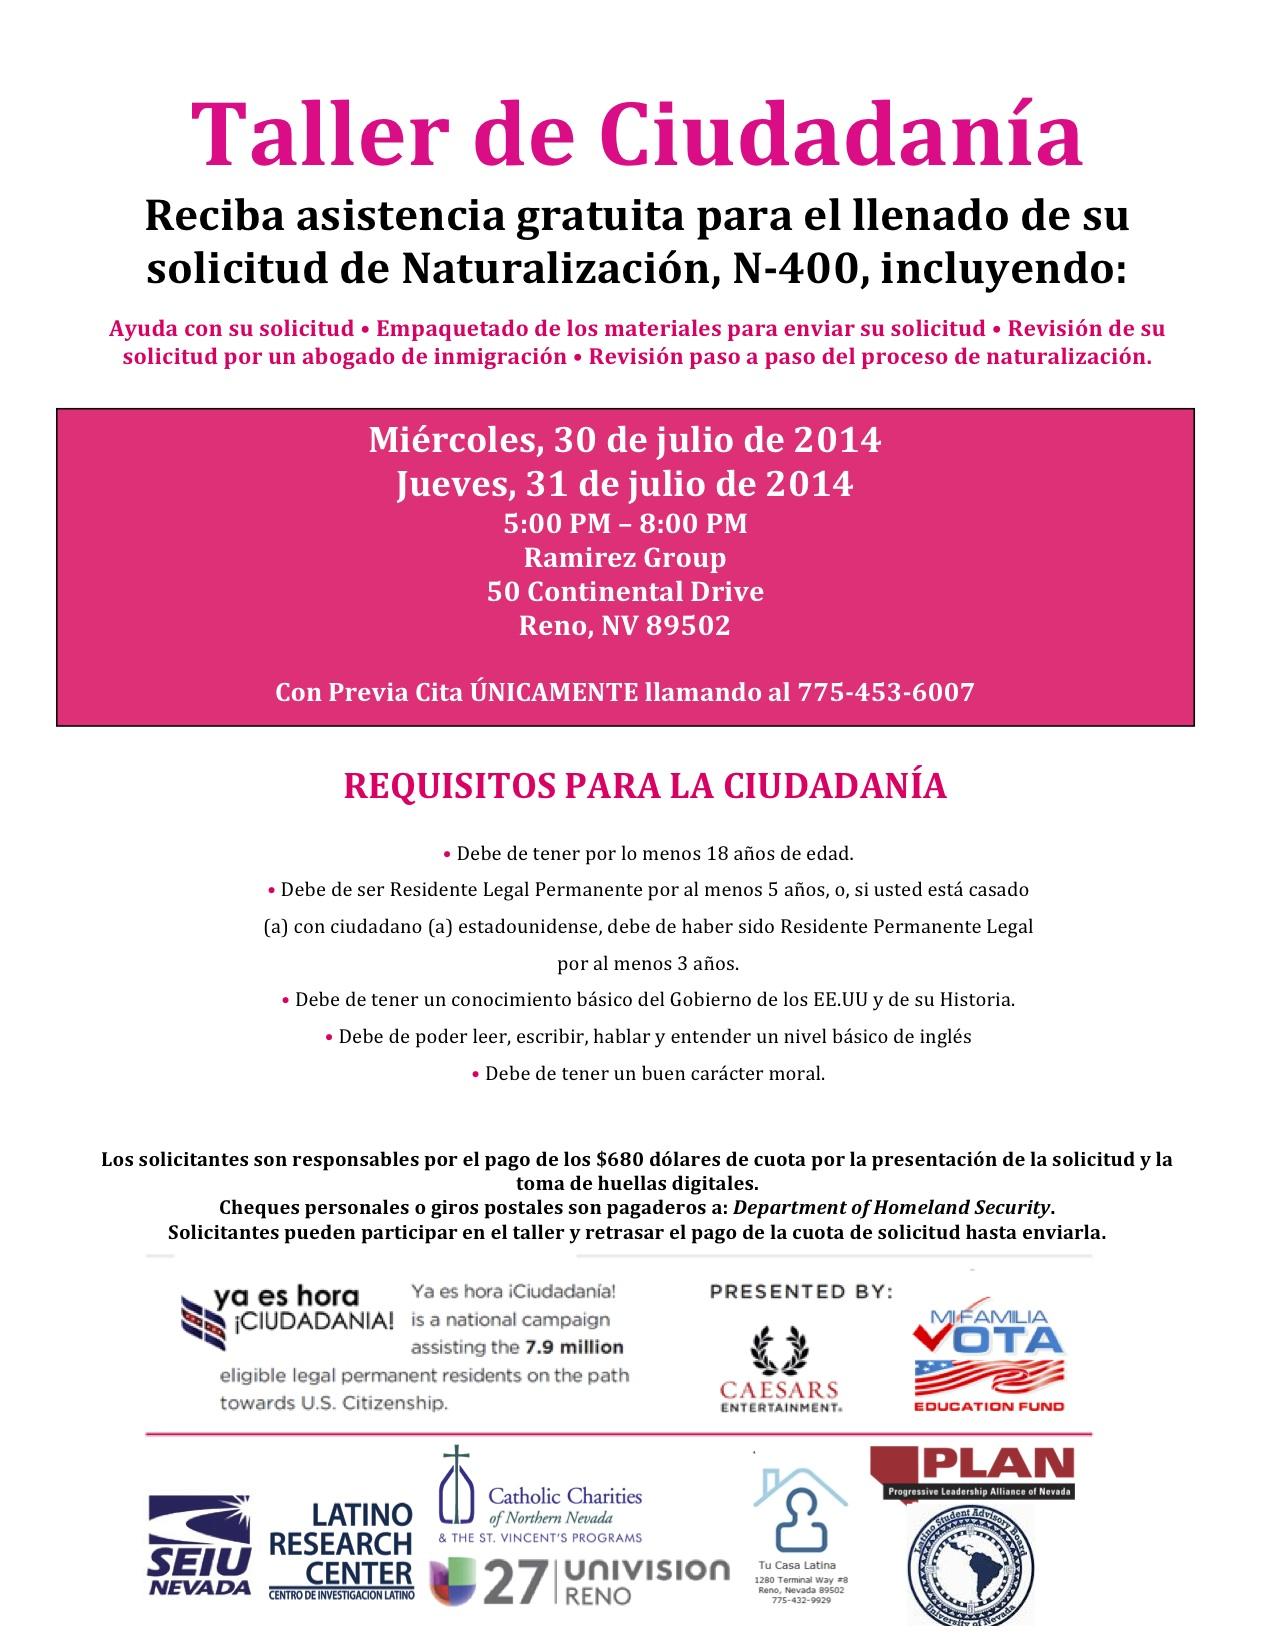 Ya_Es_Hora_Flyer_July_2014_-_Spanish.jpg